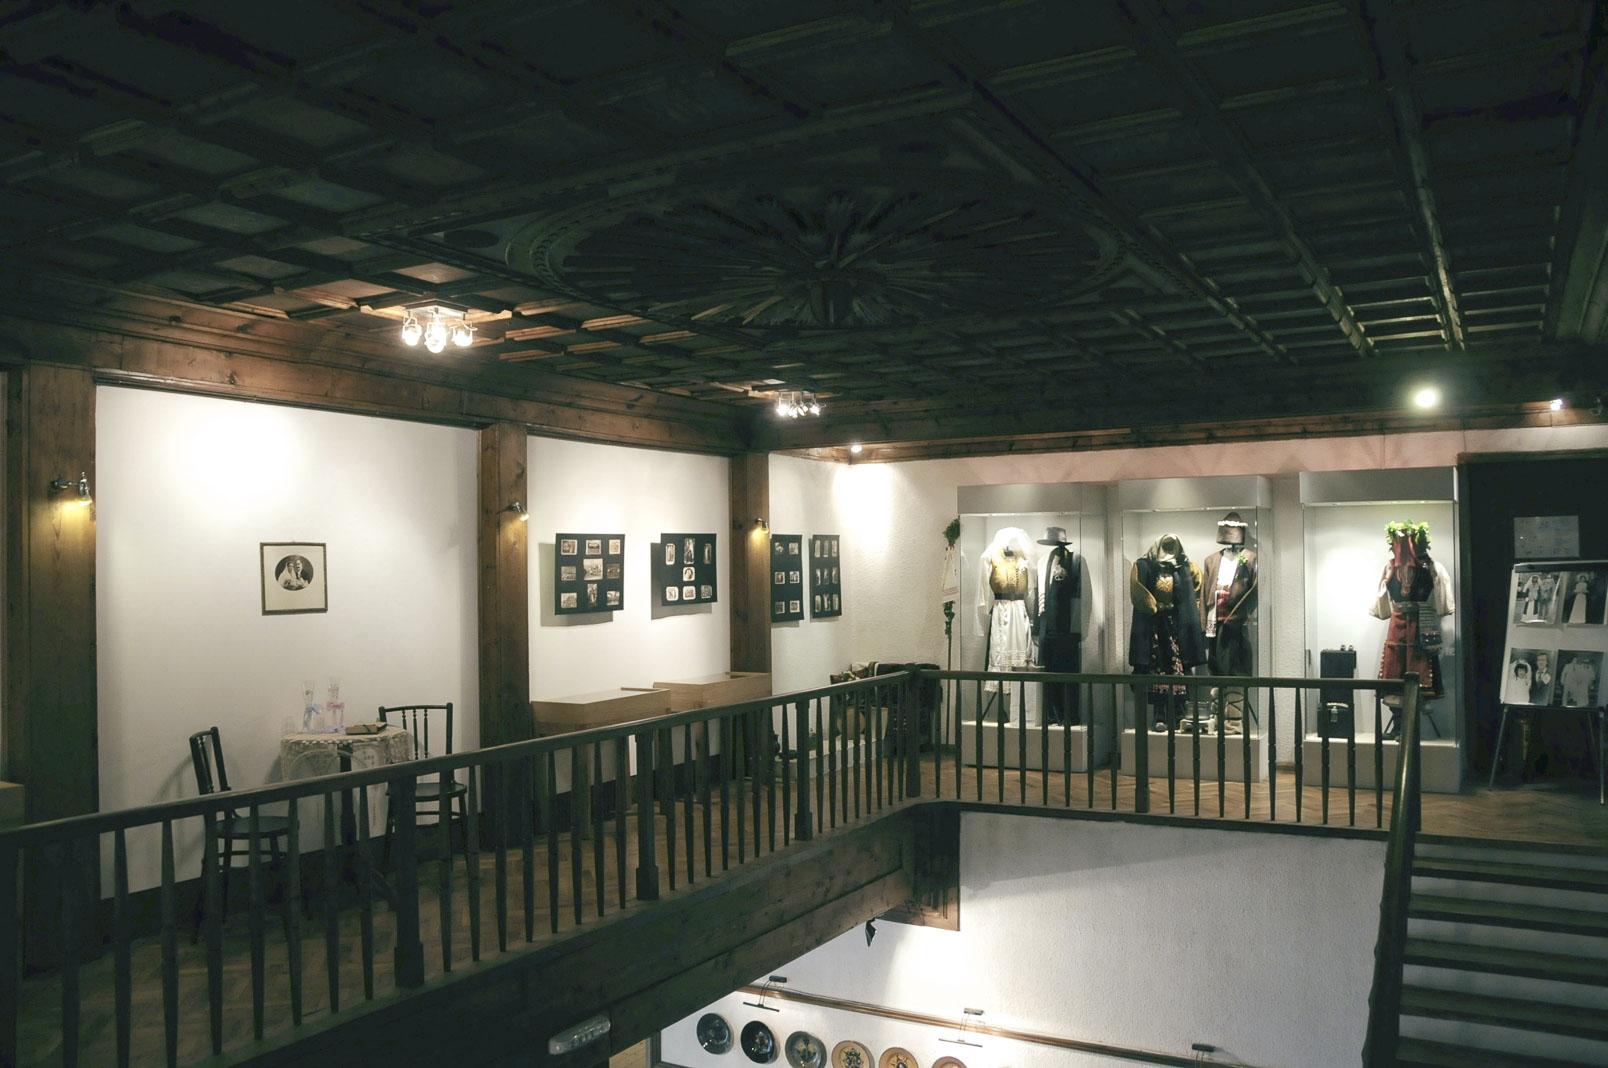 troyan-museum-svatben-spomen-24